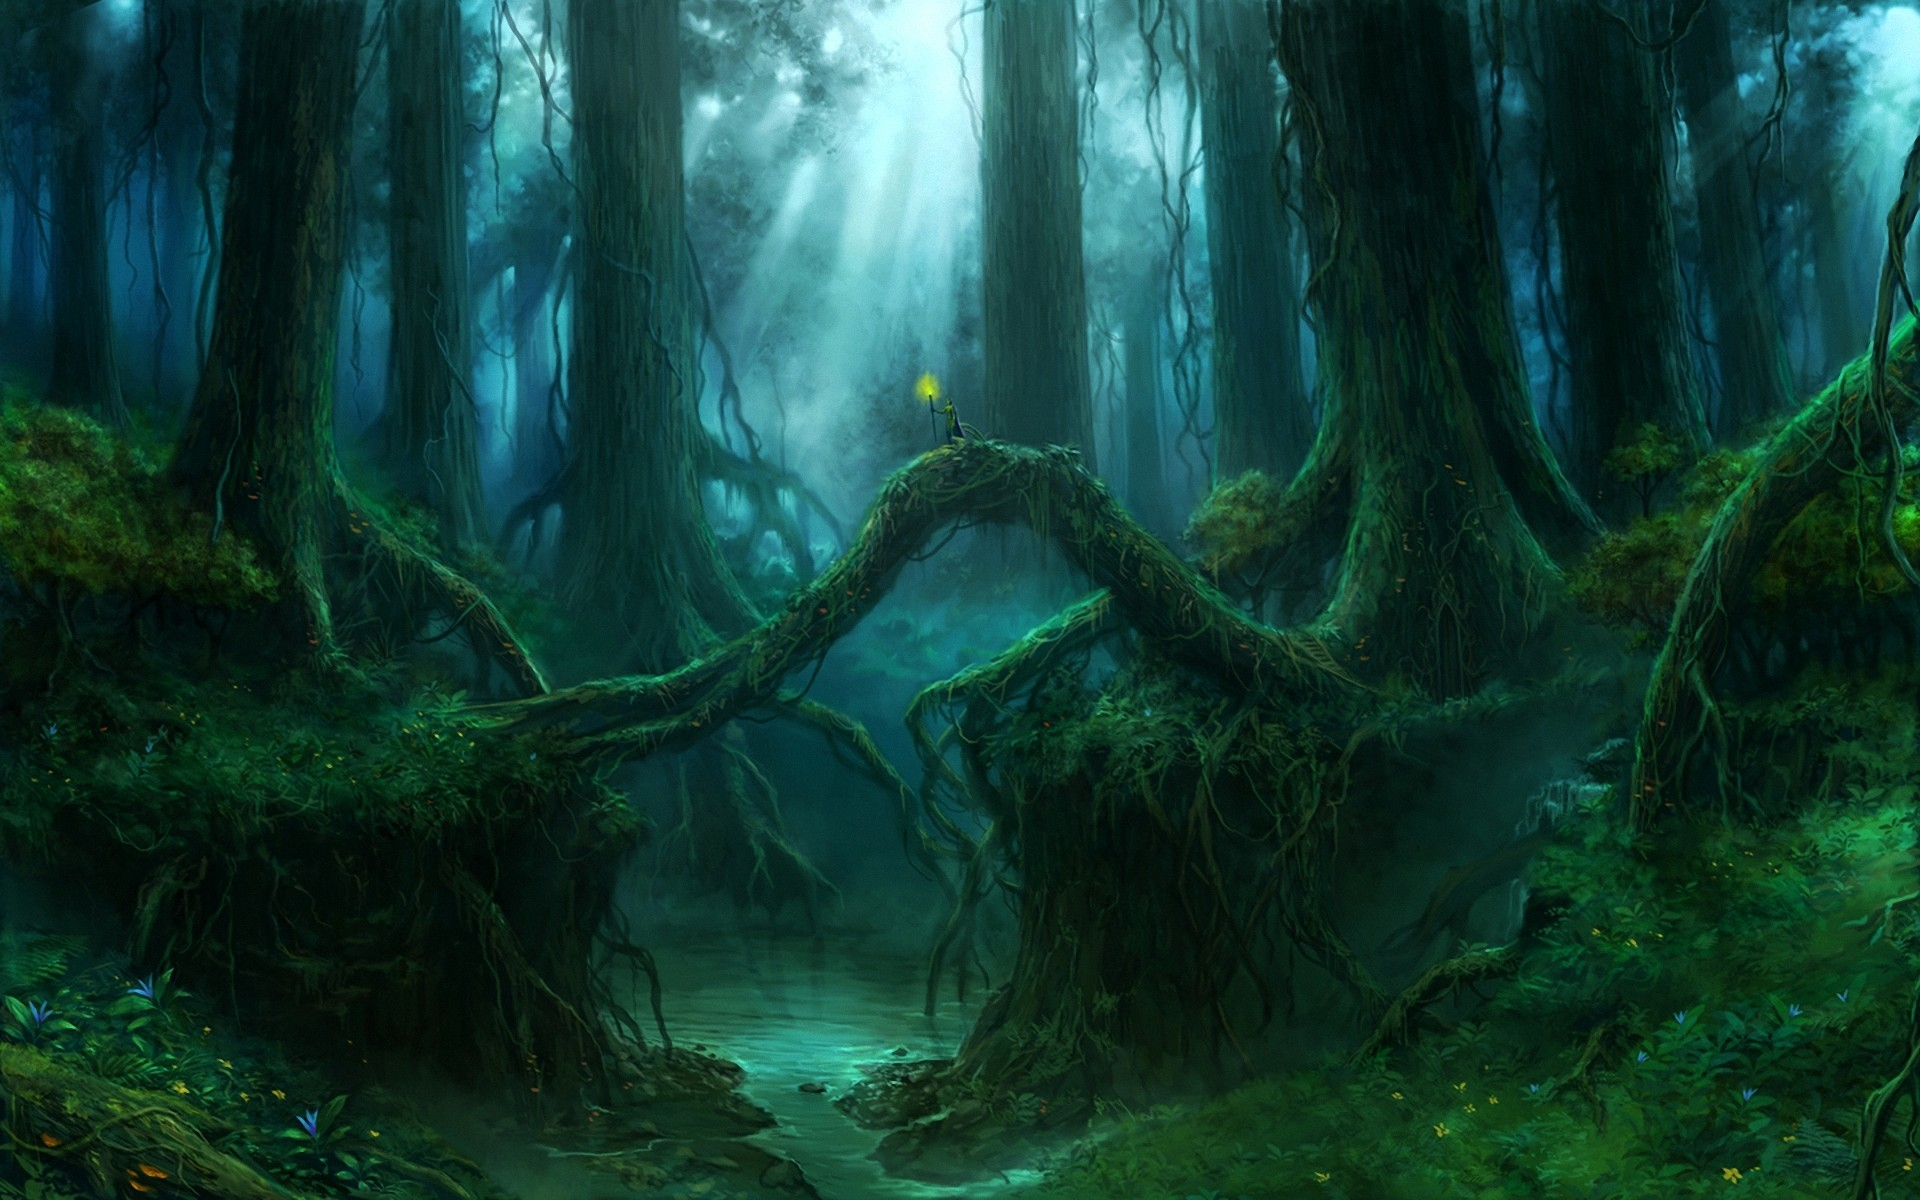 Fantasy – Forest – Wood Wallpaper